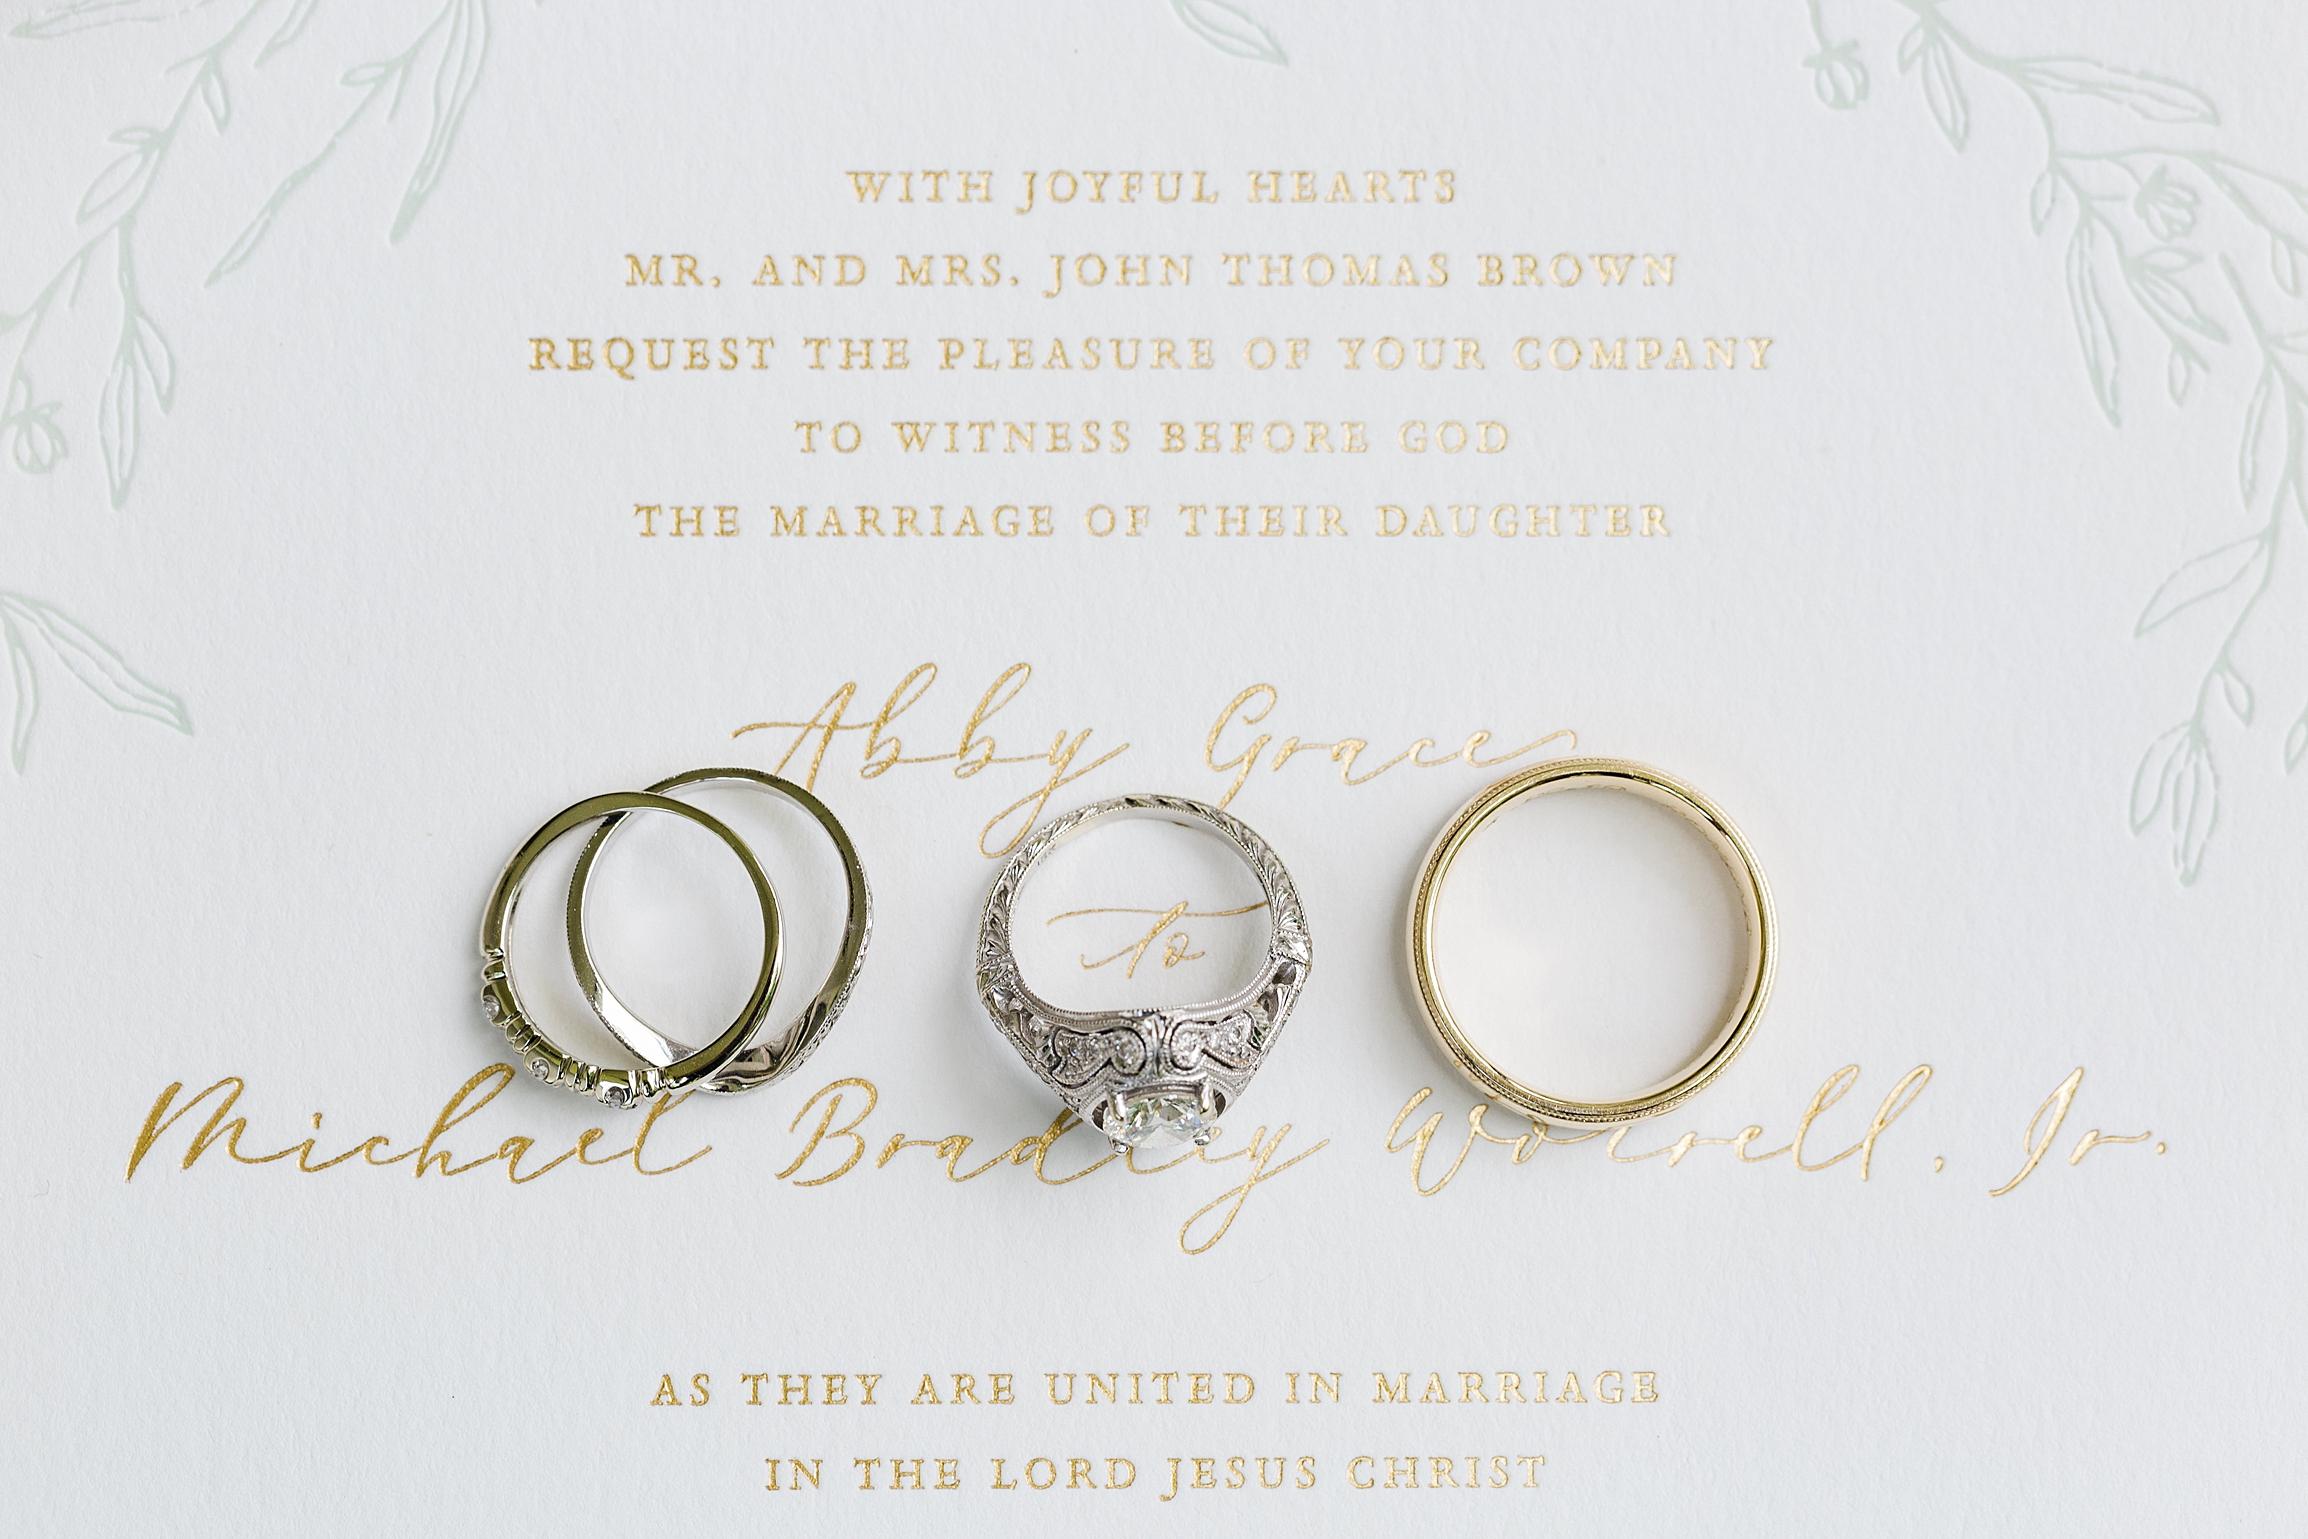 birmingham Wedding Potographer_0003.jpg